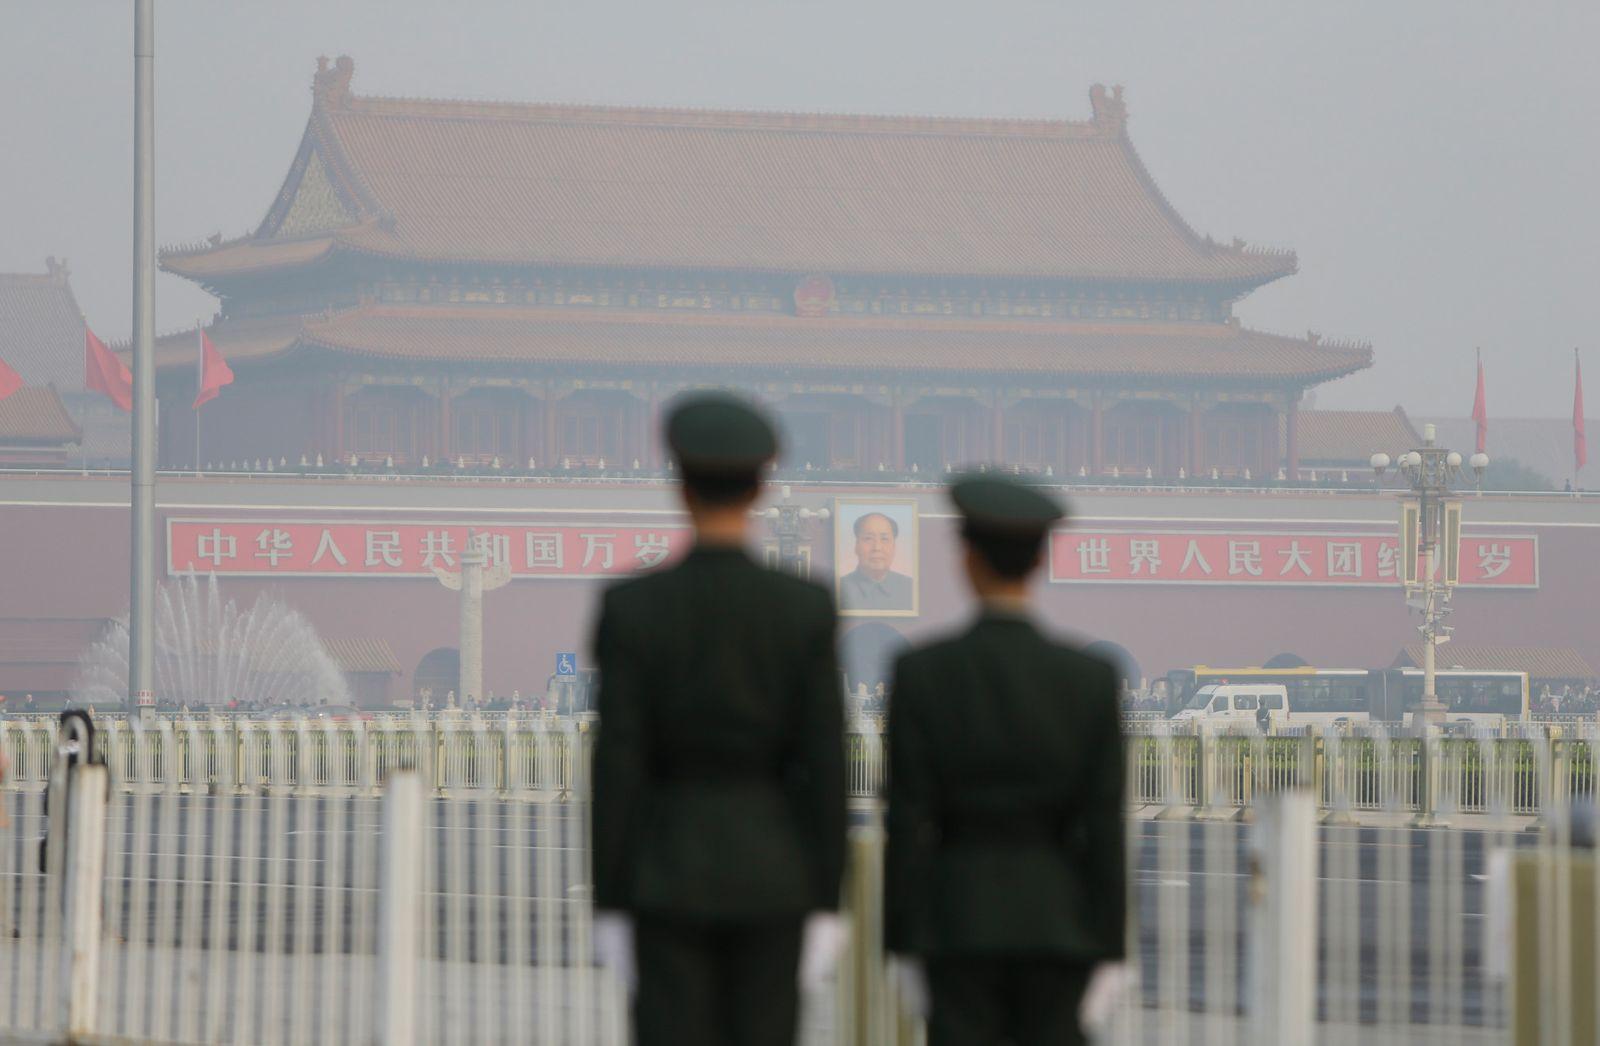 2013 / Peking / Smog